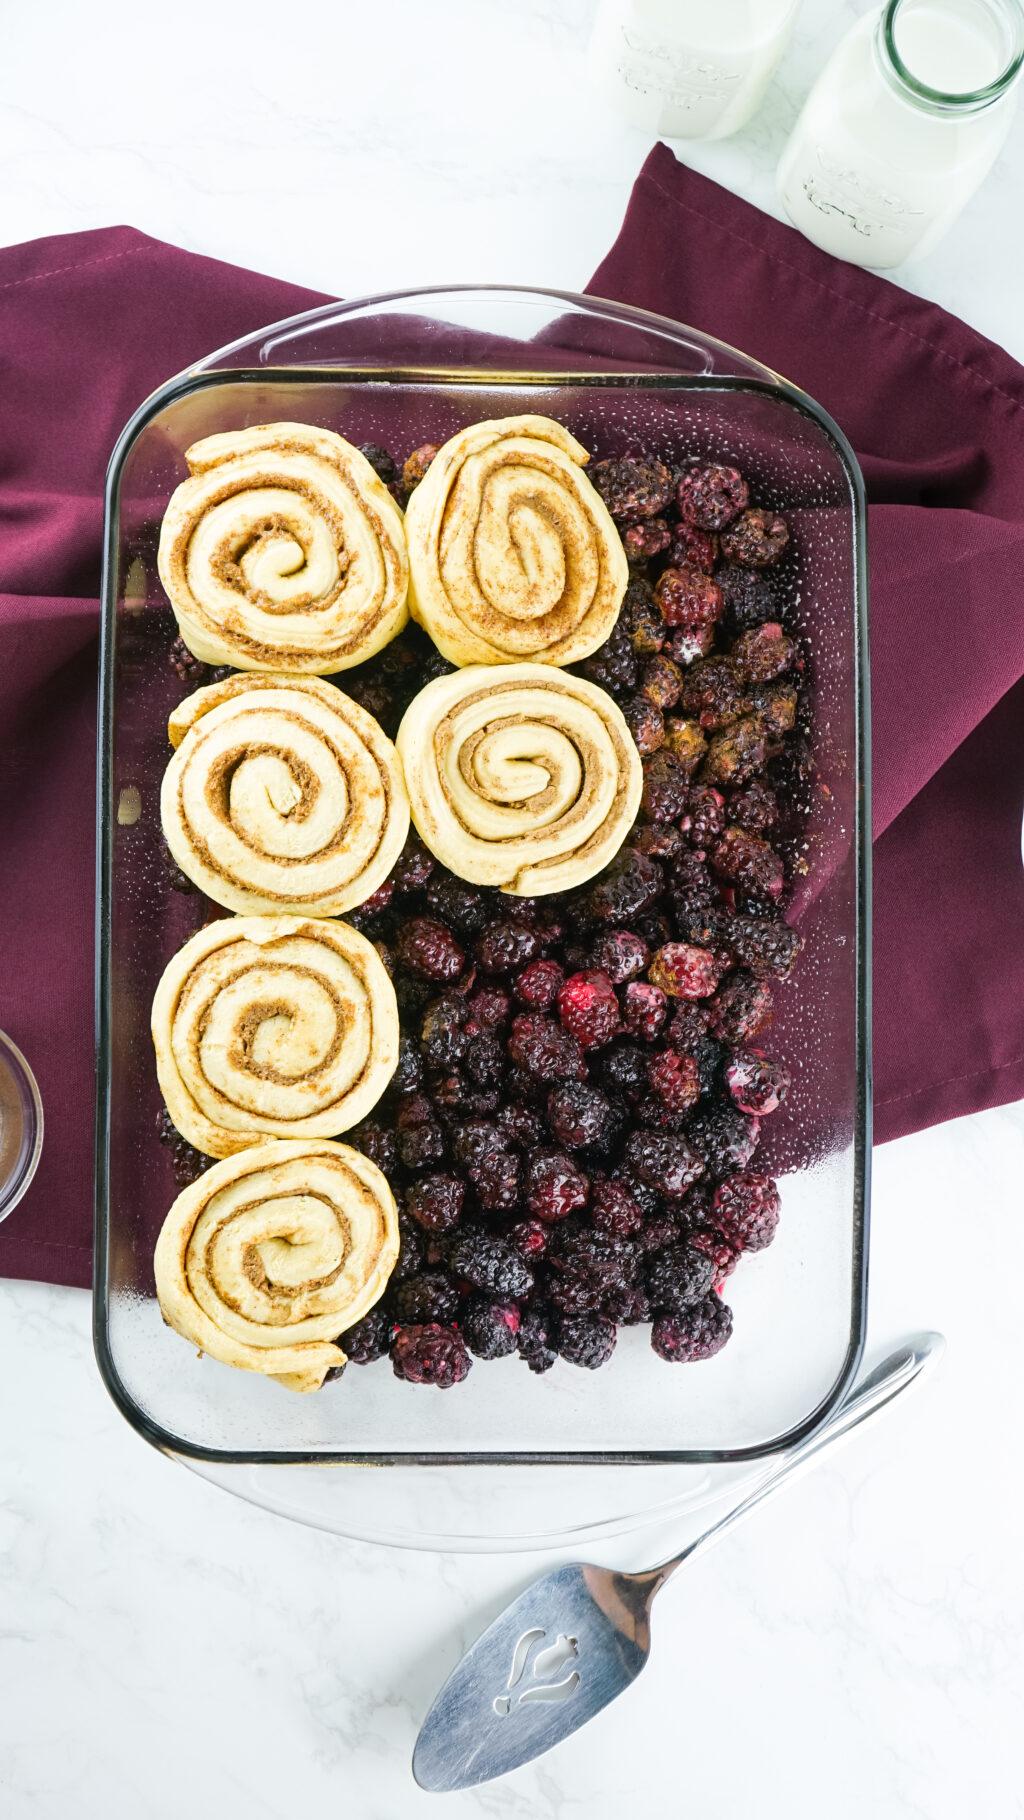 raw cinnamon rolls on top of blackberries in a baking dish